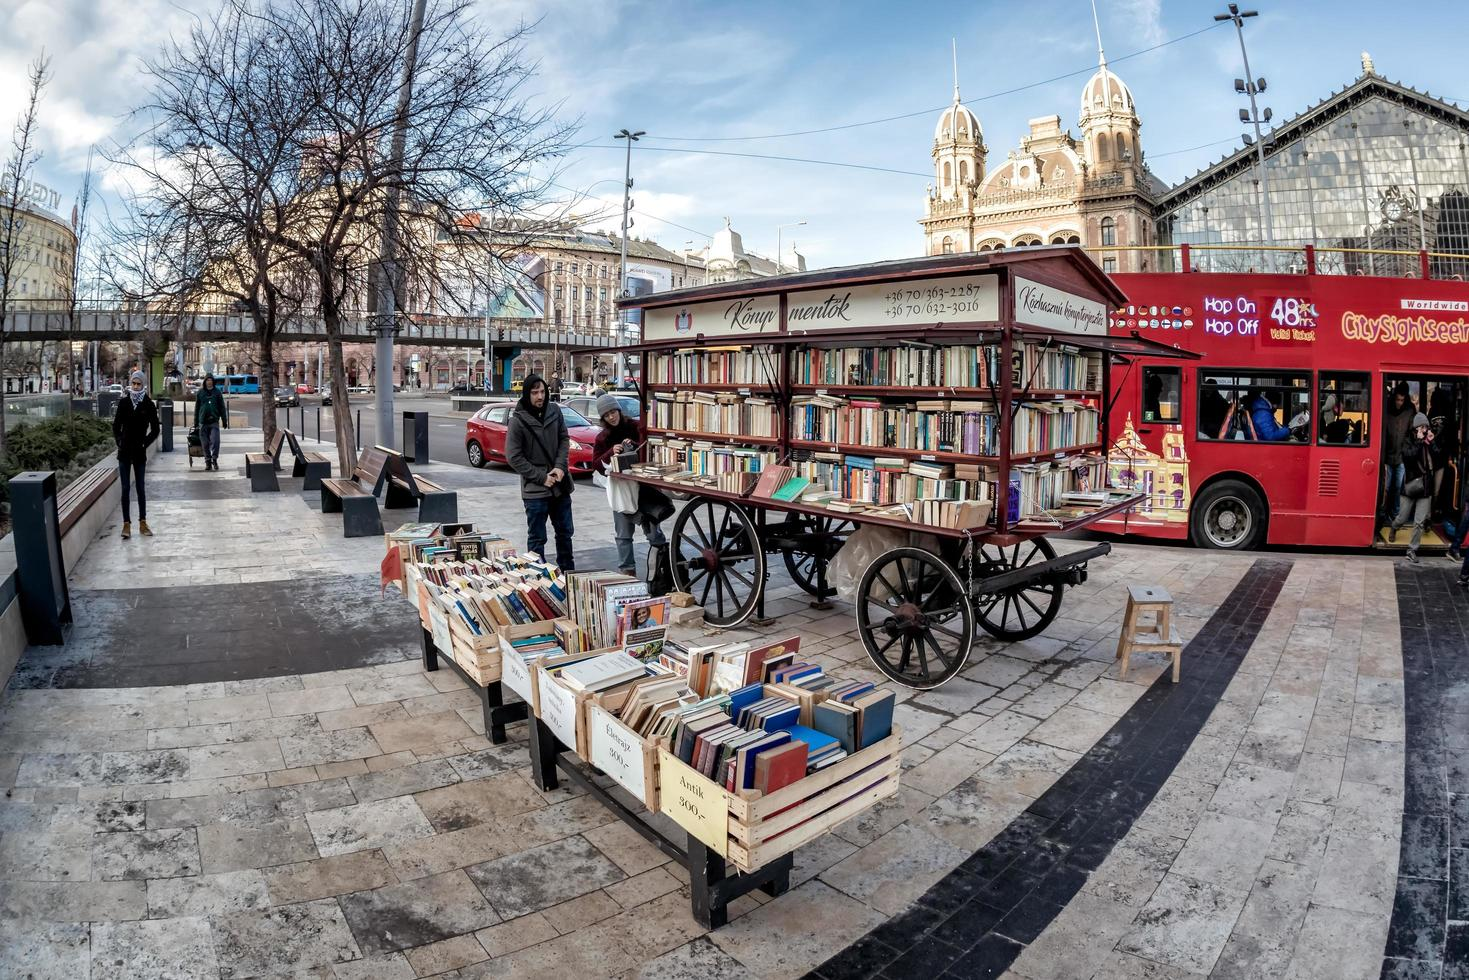 Boedapest, Hongarije 2019 - Boekverkoperskar vlakbij het metrostation foto